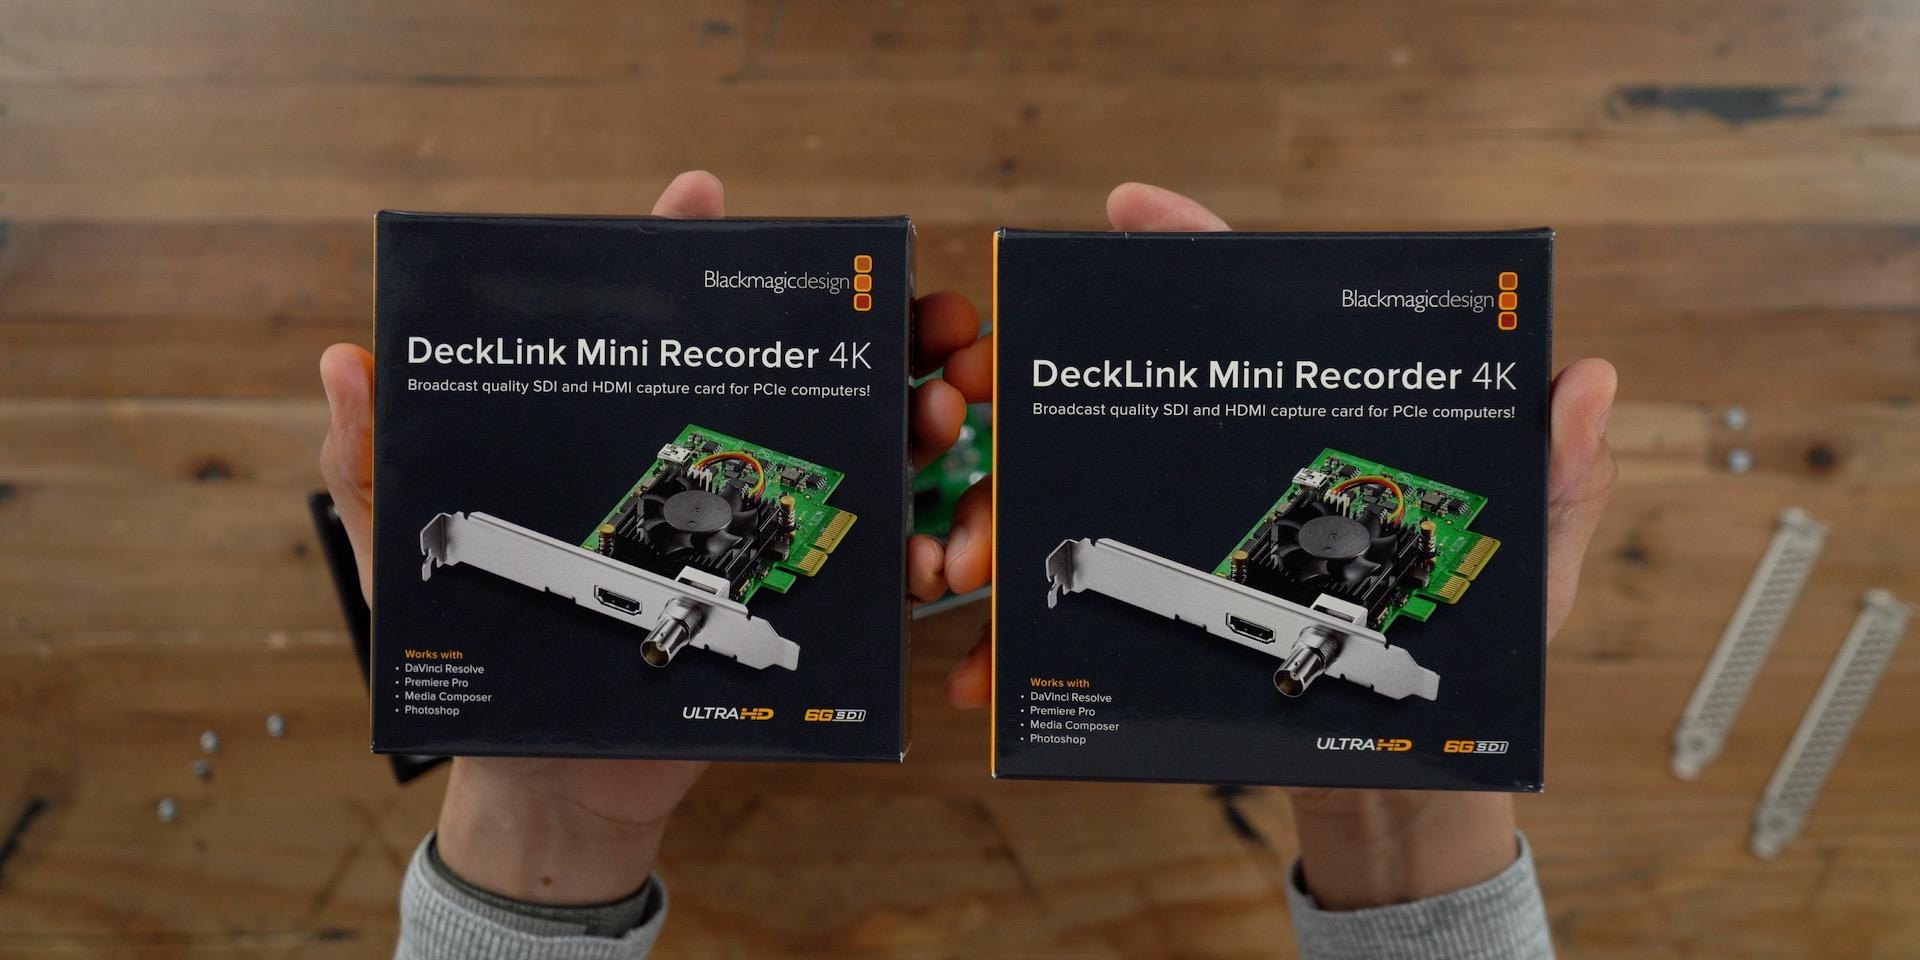 Blackmagic DeckLink Mini Recorder 4K Boxes